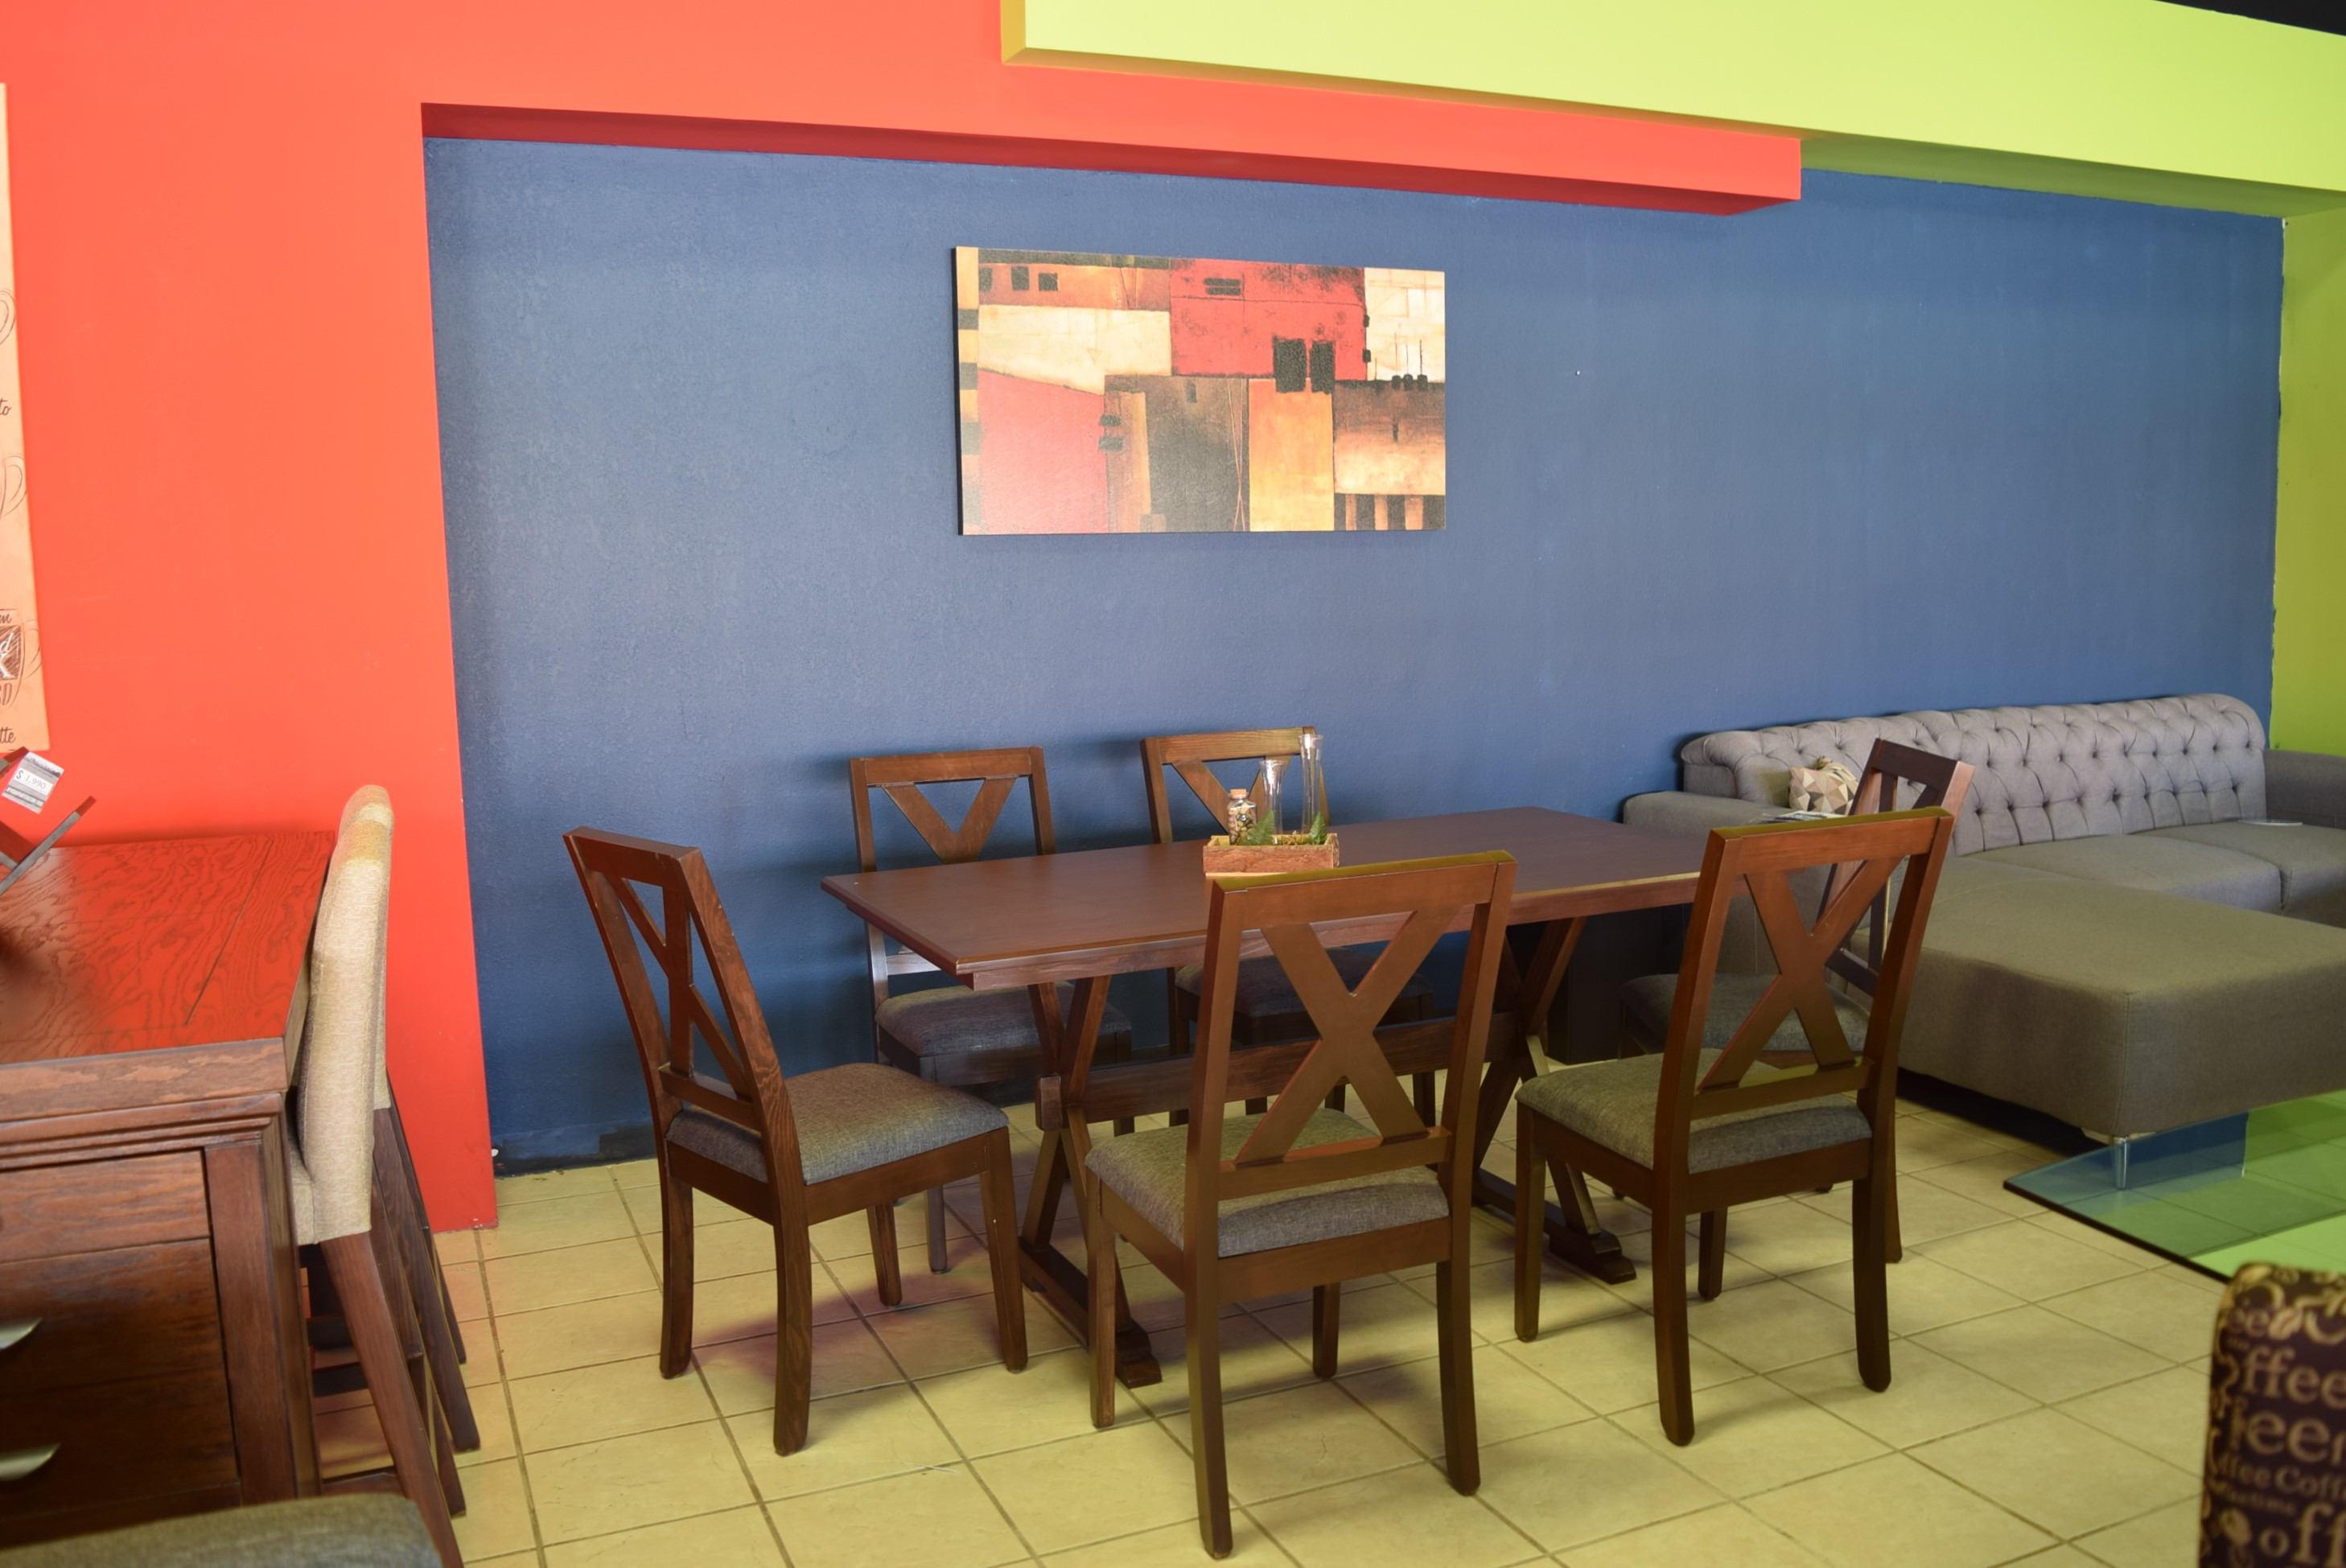 Nuovomuebleria # Muebles Nuovo Cd Juarez